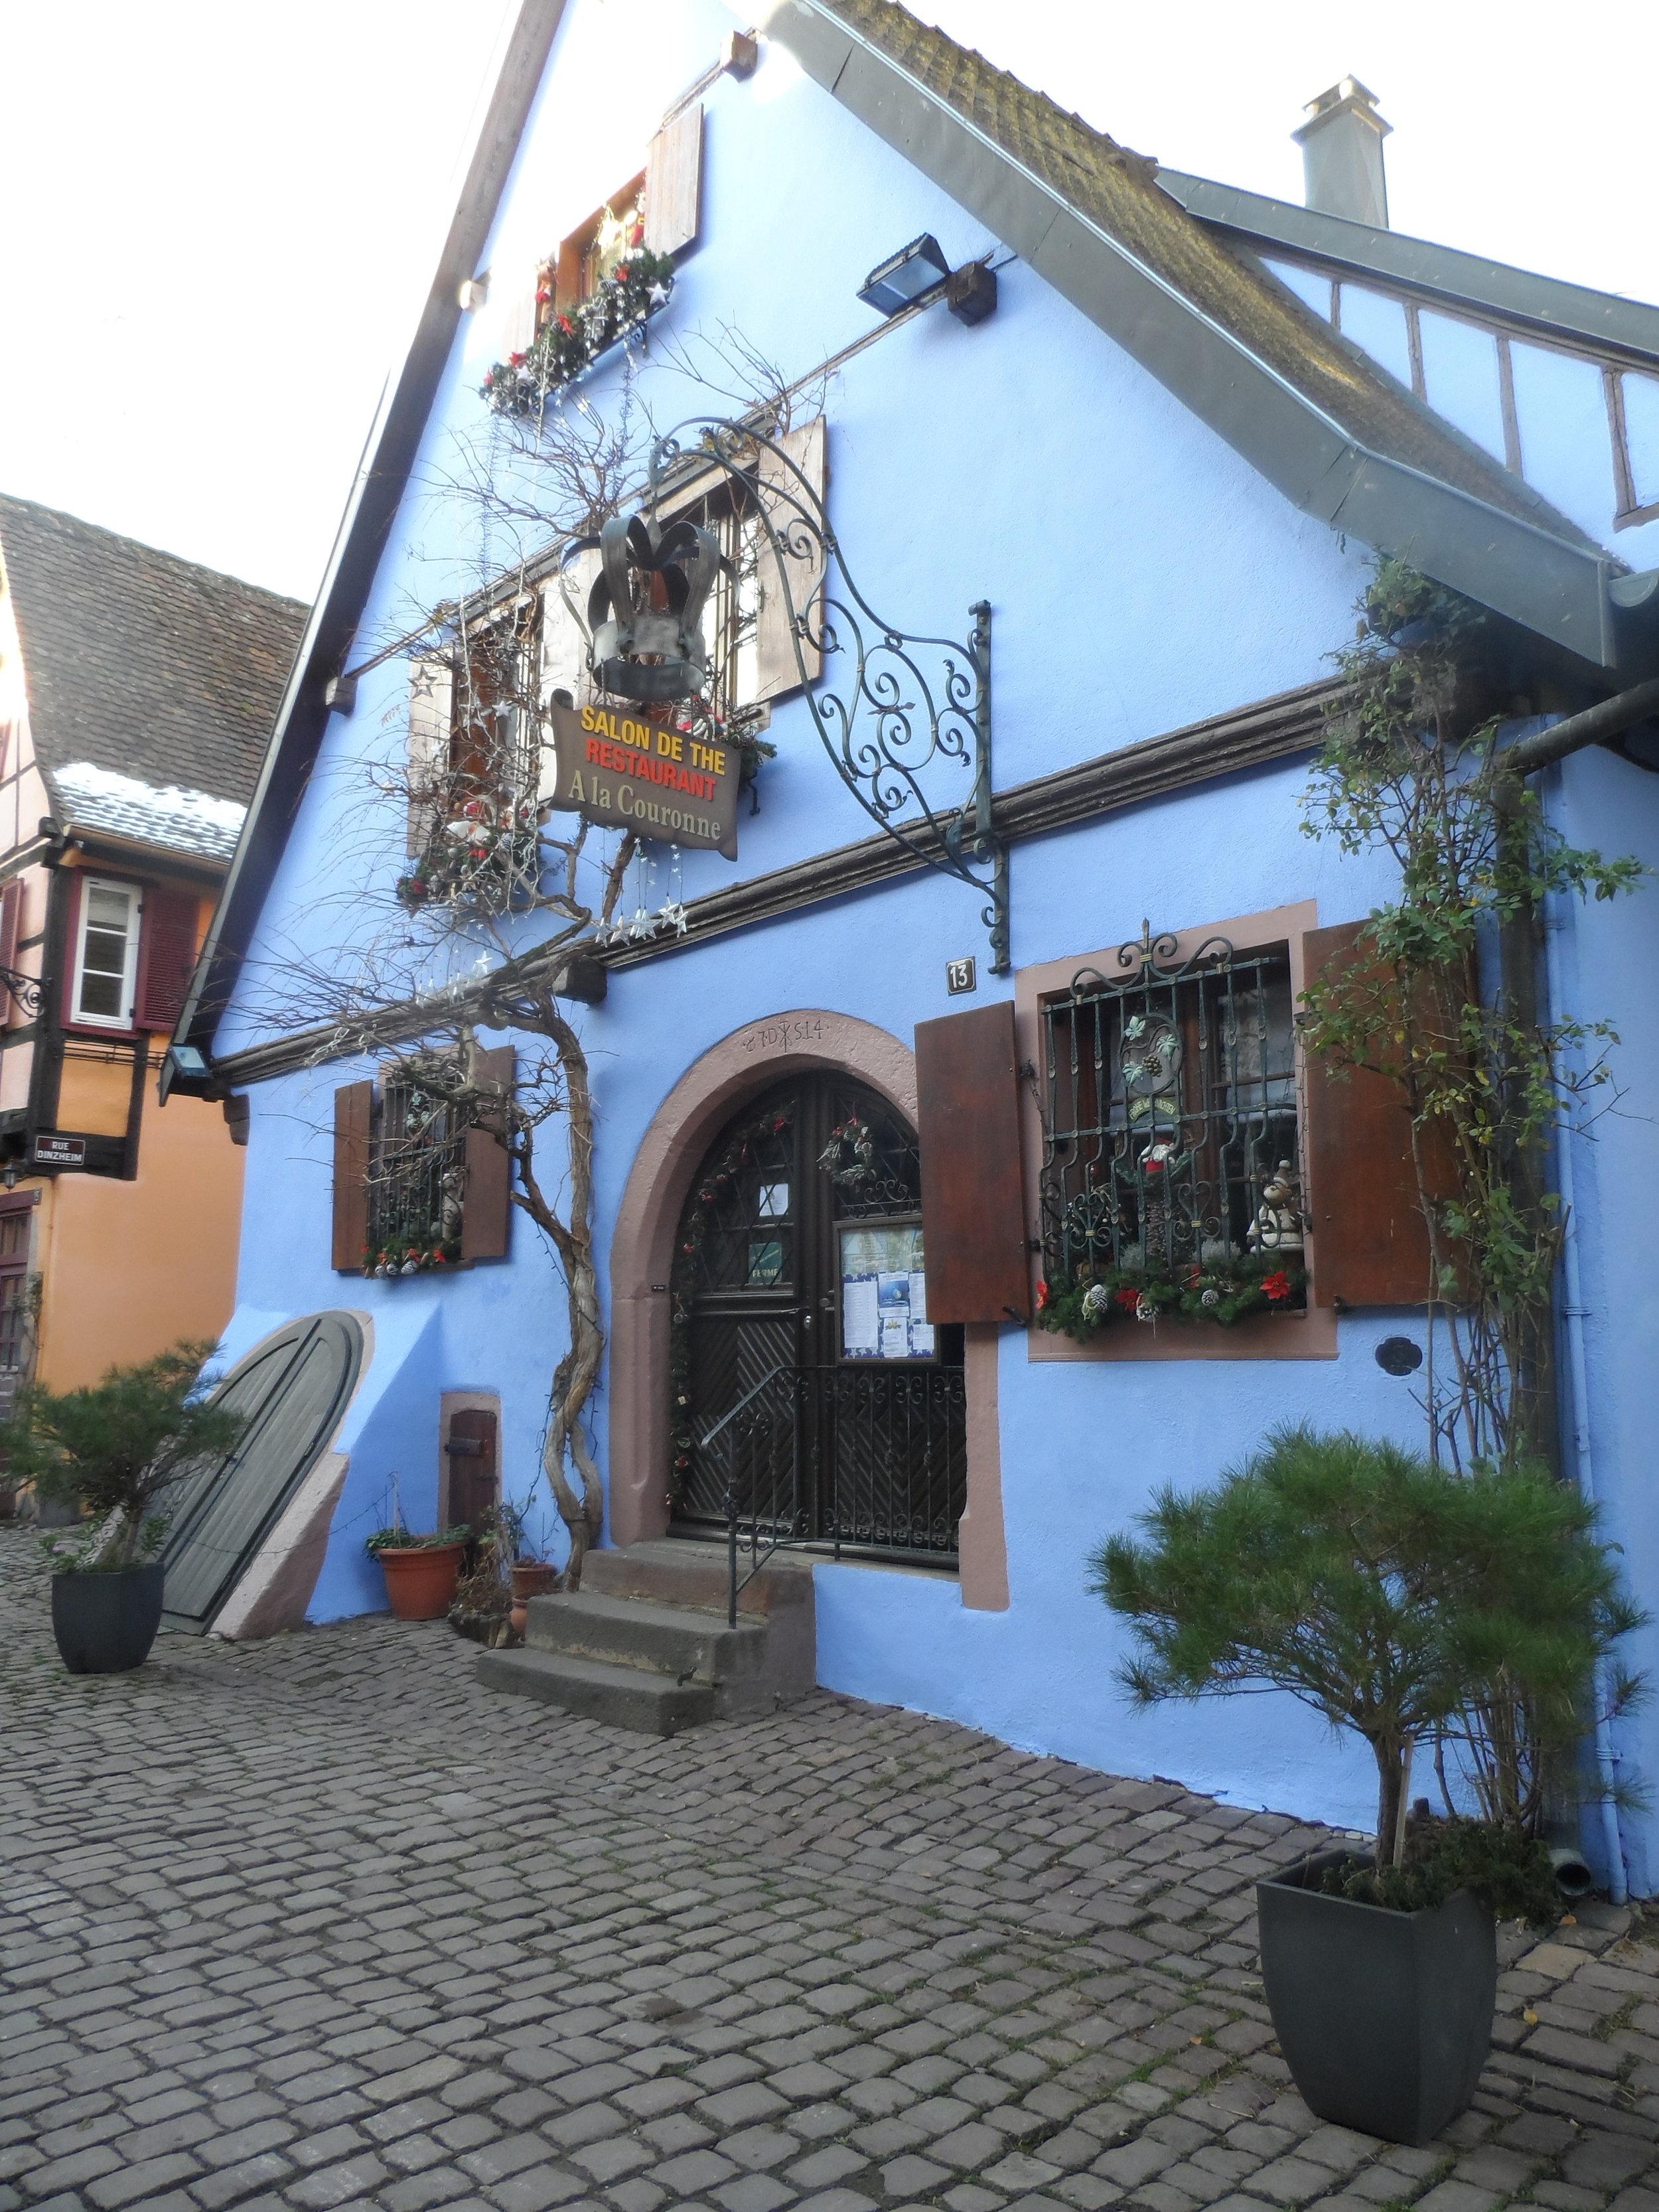 Brilliant, vivid blue colored building in Riquewhir